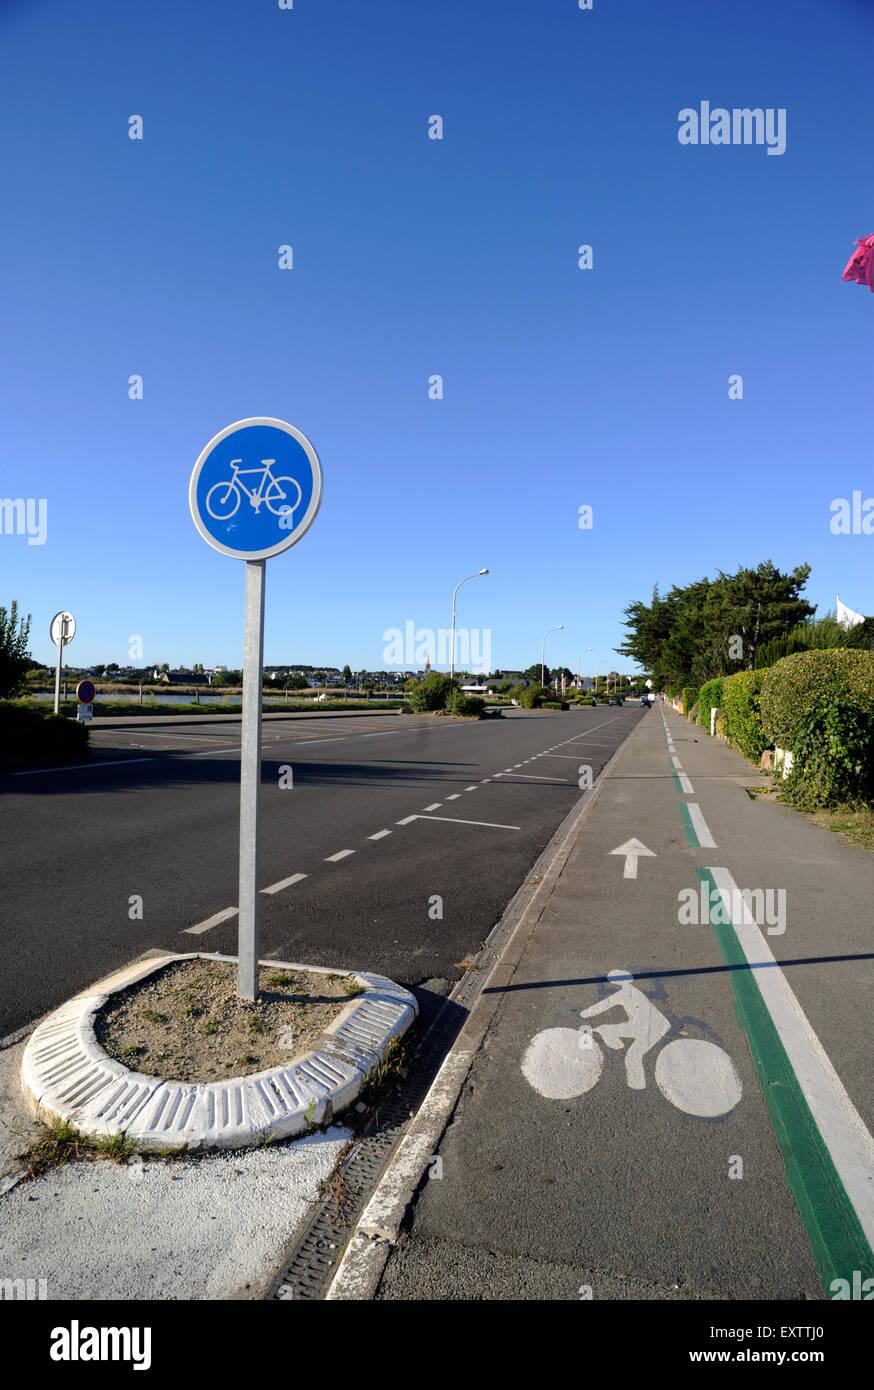 france, brittany (bretagne), morbihan, carnac, cycle lane - Stock Image